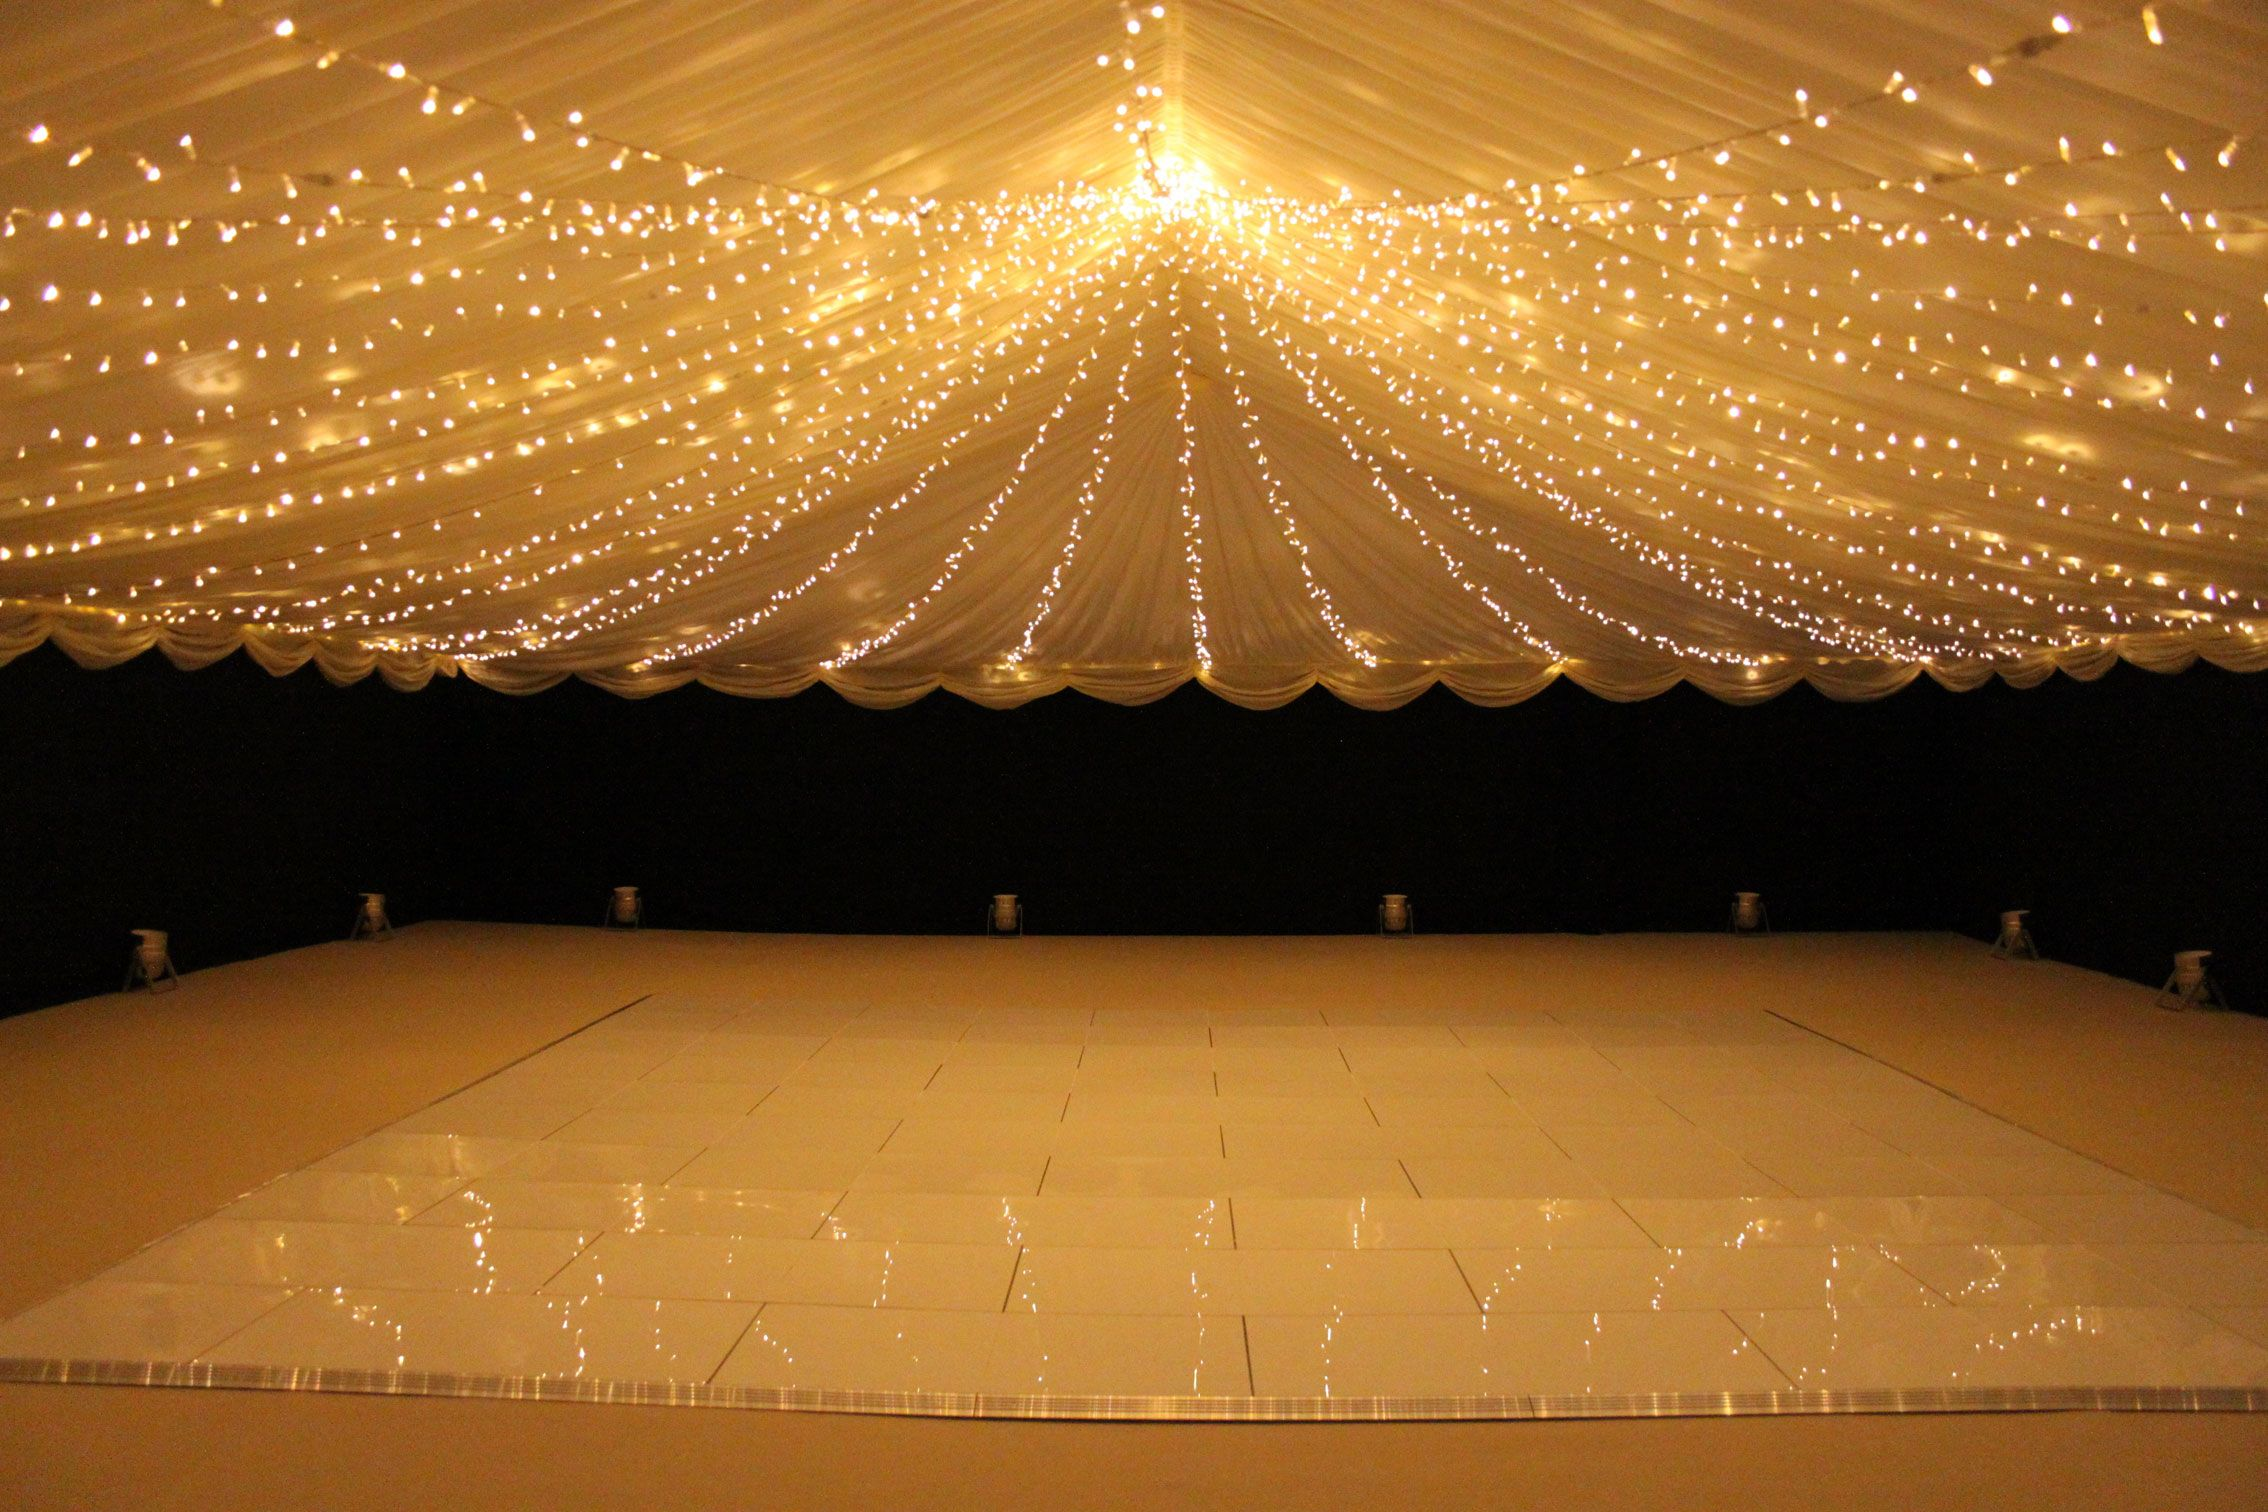 Wedding marquee decoration ideas  Marquee lining stars  Wedding Ideas  Pinterest  Marquee